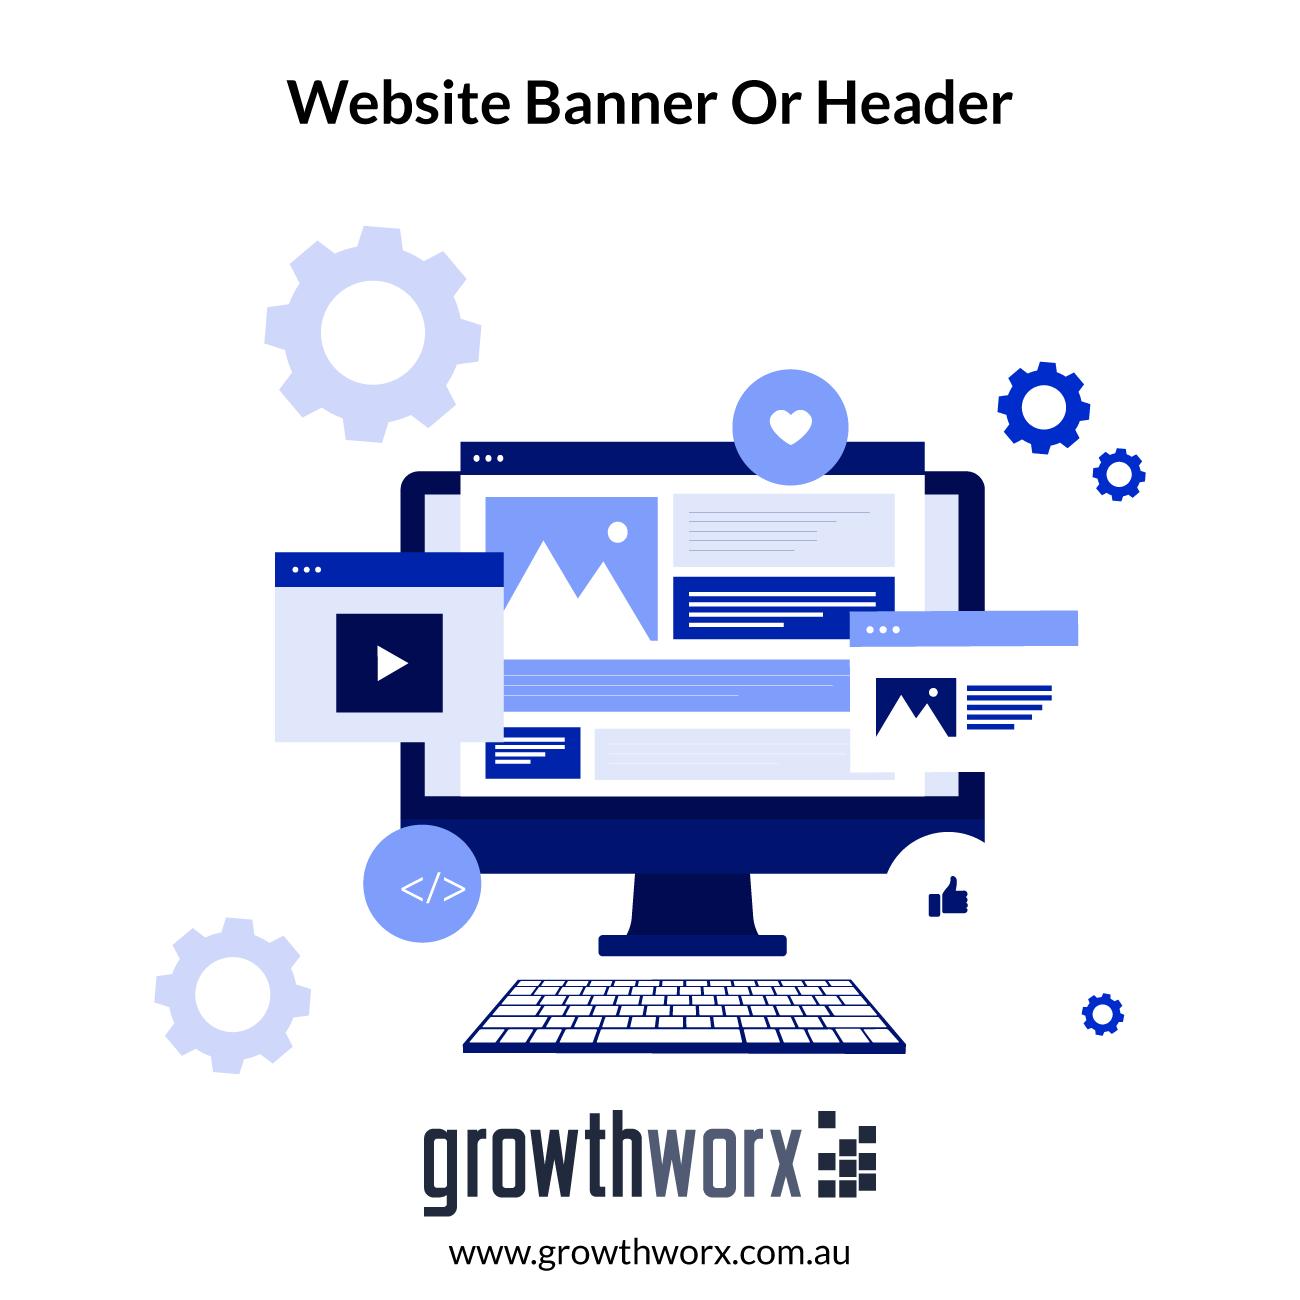 I will design a professional website banner or header 1